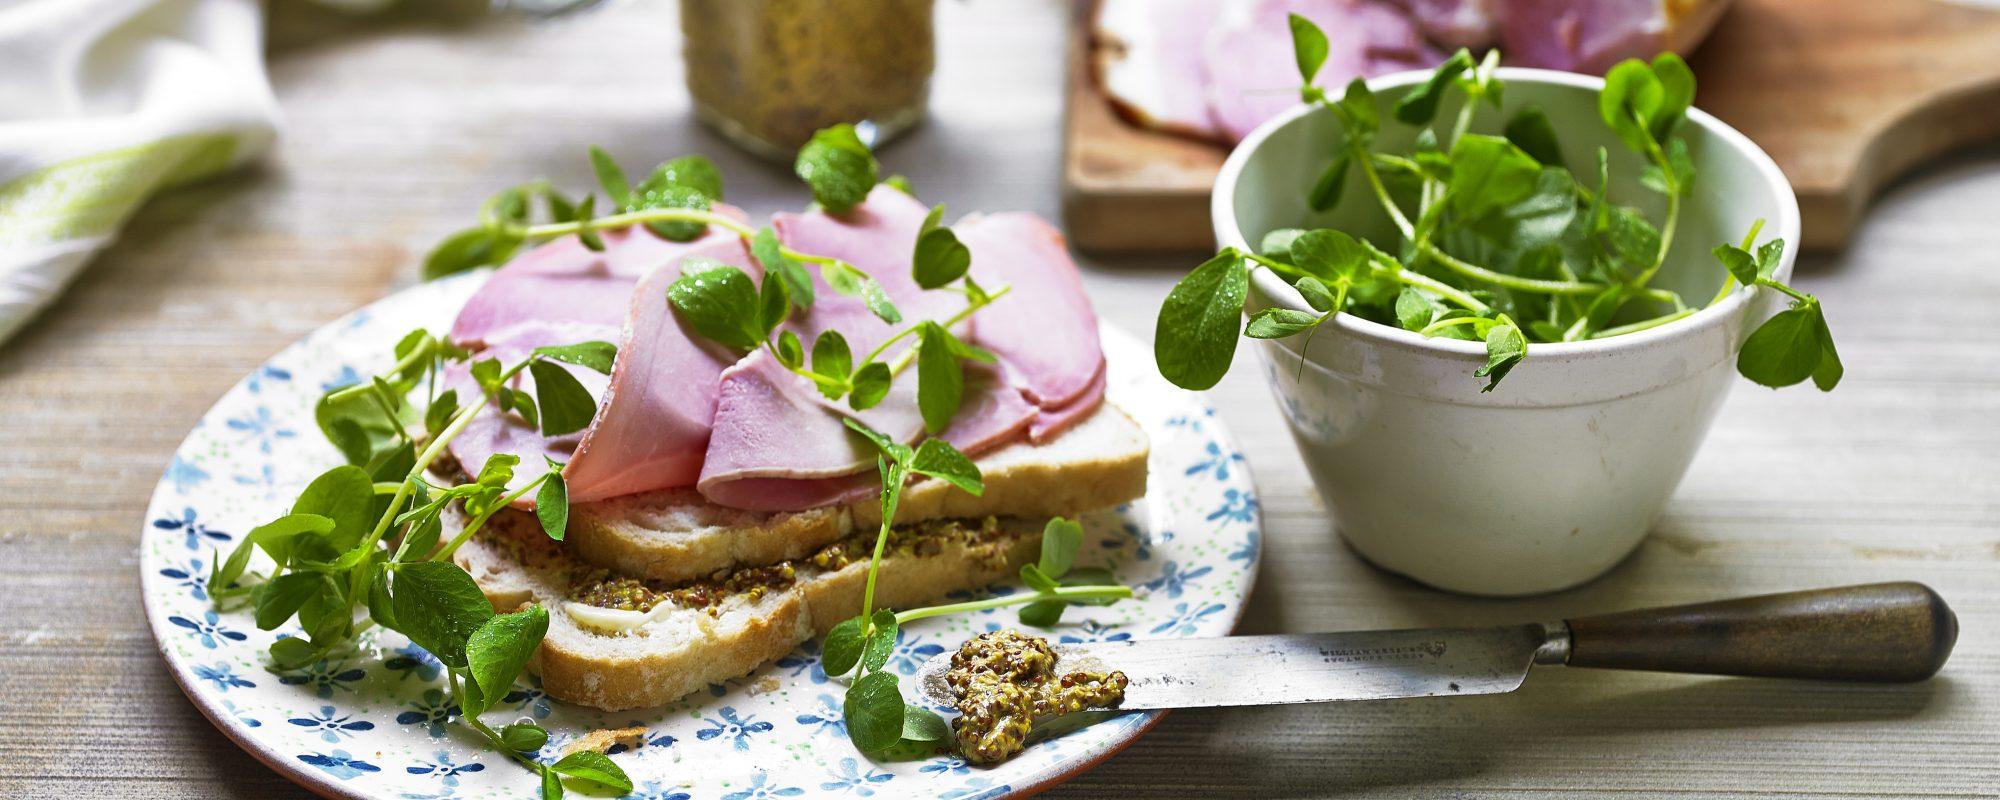 Ham, mustard and pea shoots sandwich